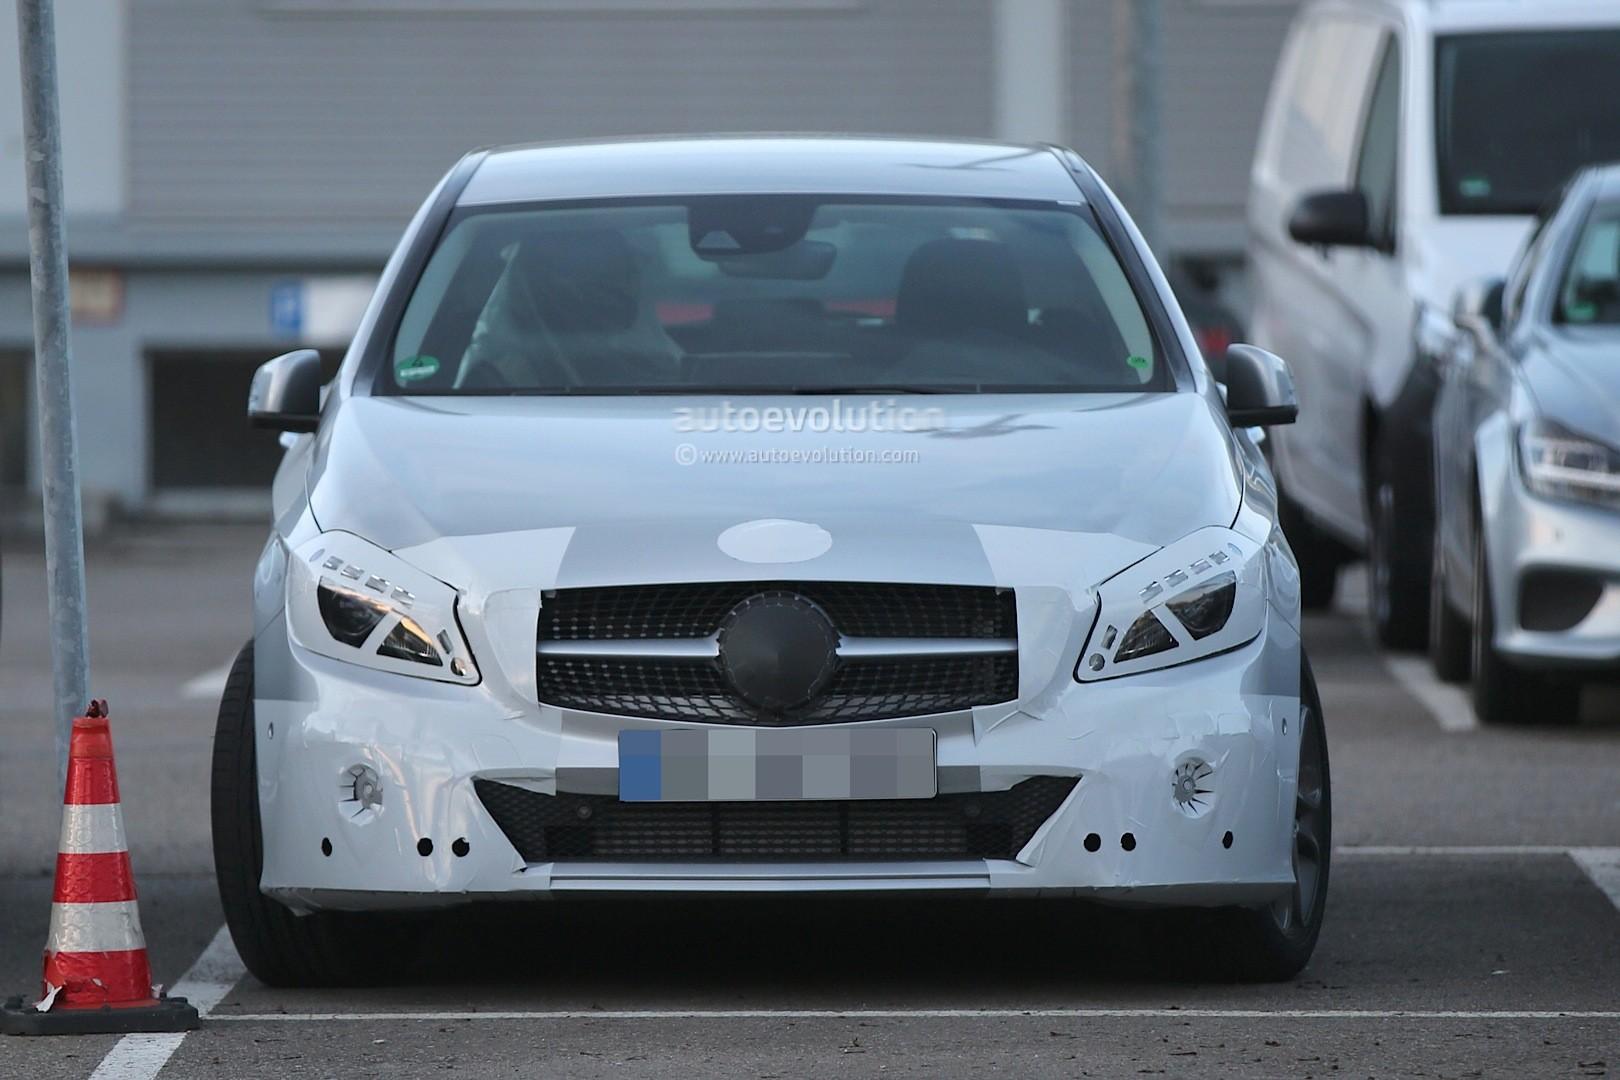 2016 - [Mercedes] Classe A restylée - Page 5 Spyshots-2015-mercedes-a-class-facelift-getting-headlight-tweaks_8